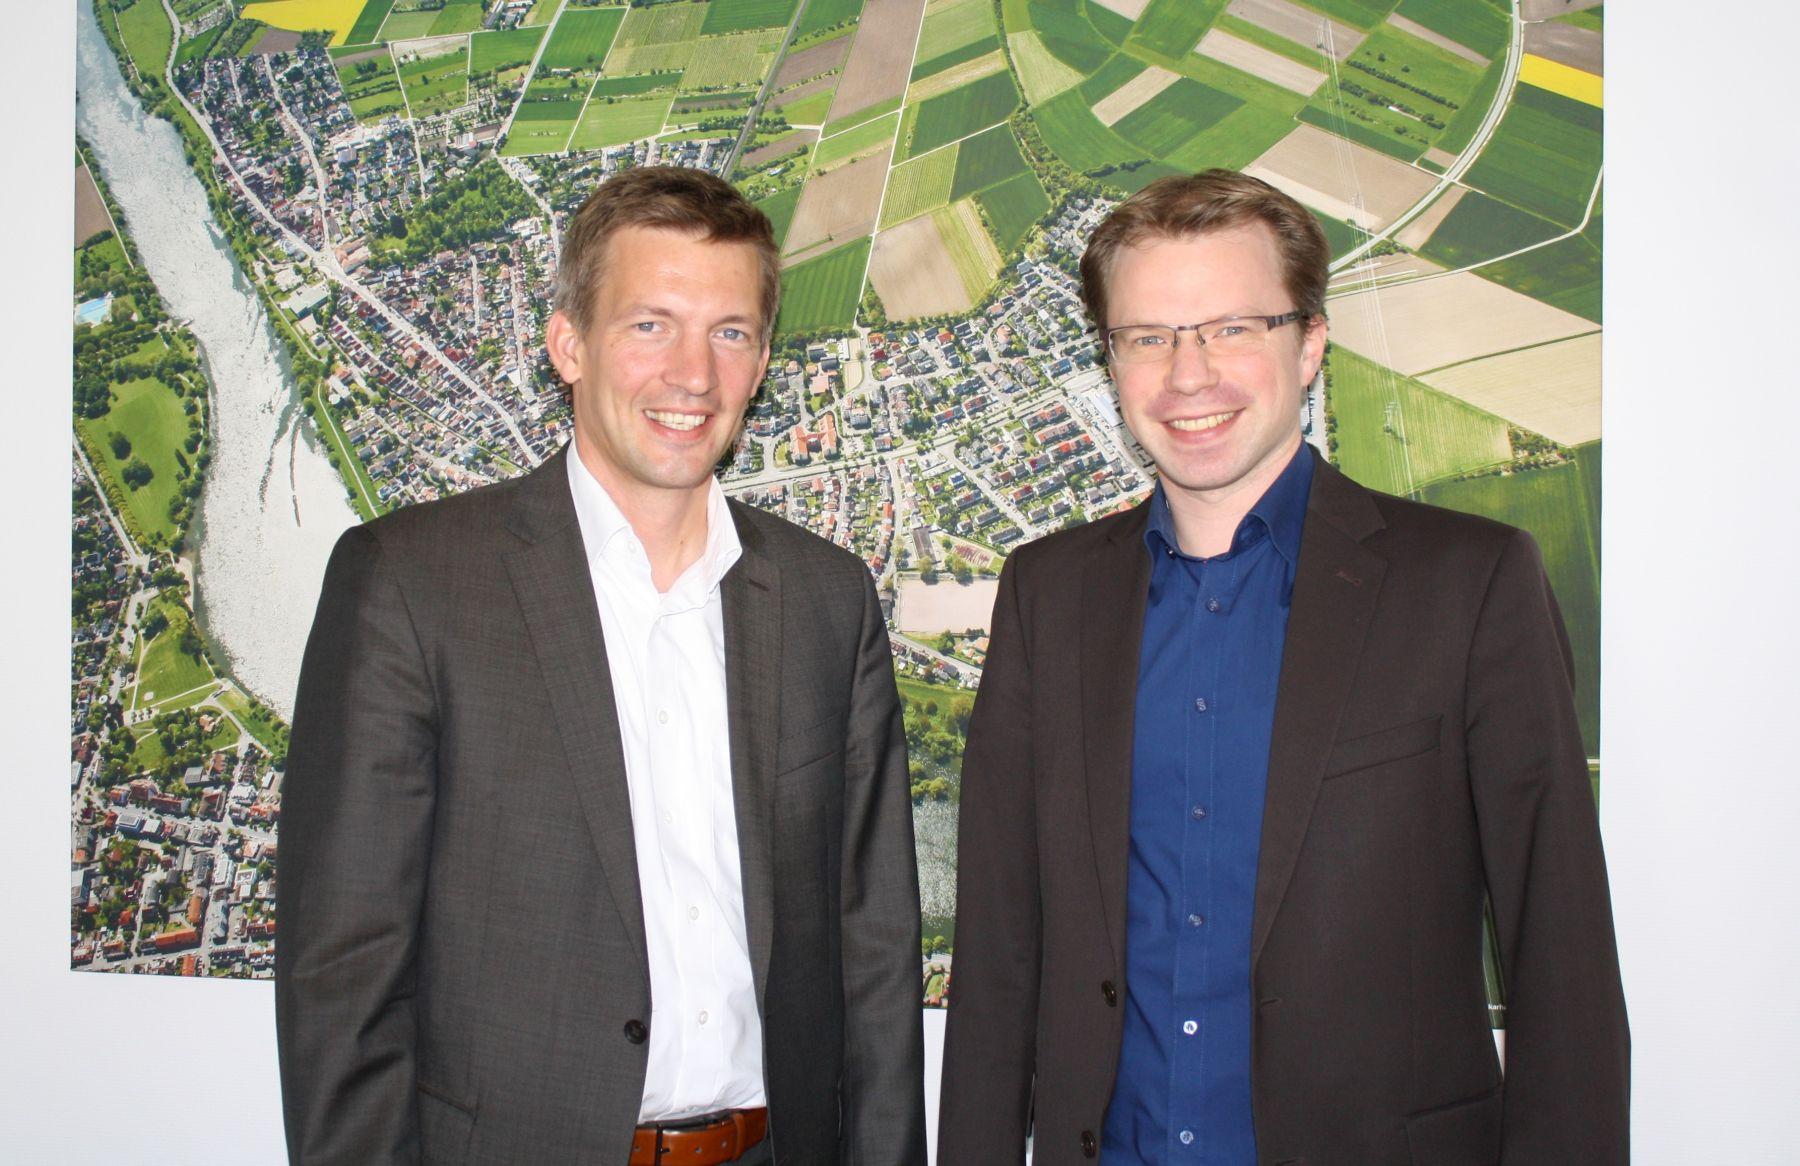 A - Ladenburgs Bürgermeister zu Gast in ED-NE - Bild BMA-CD